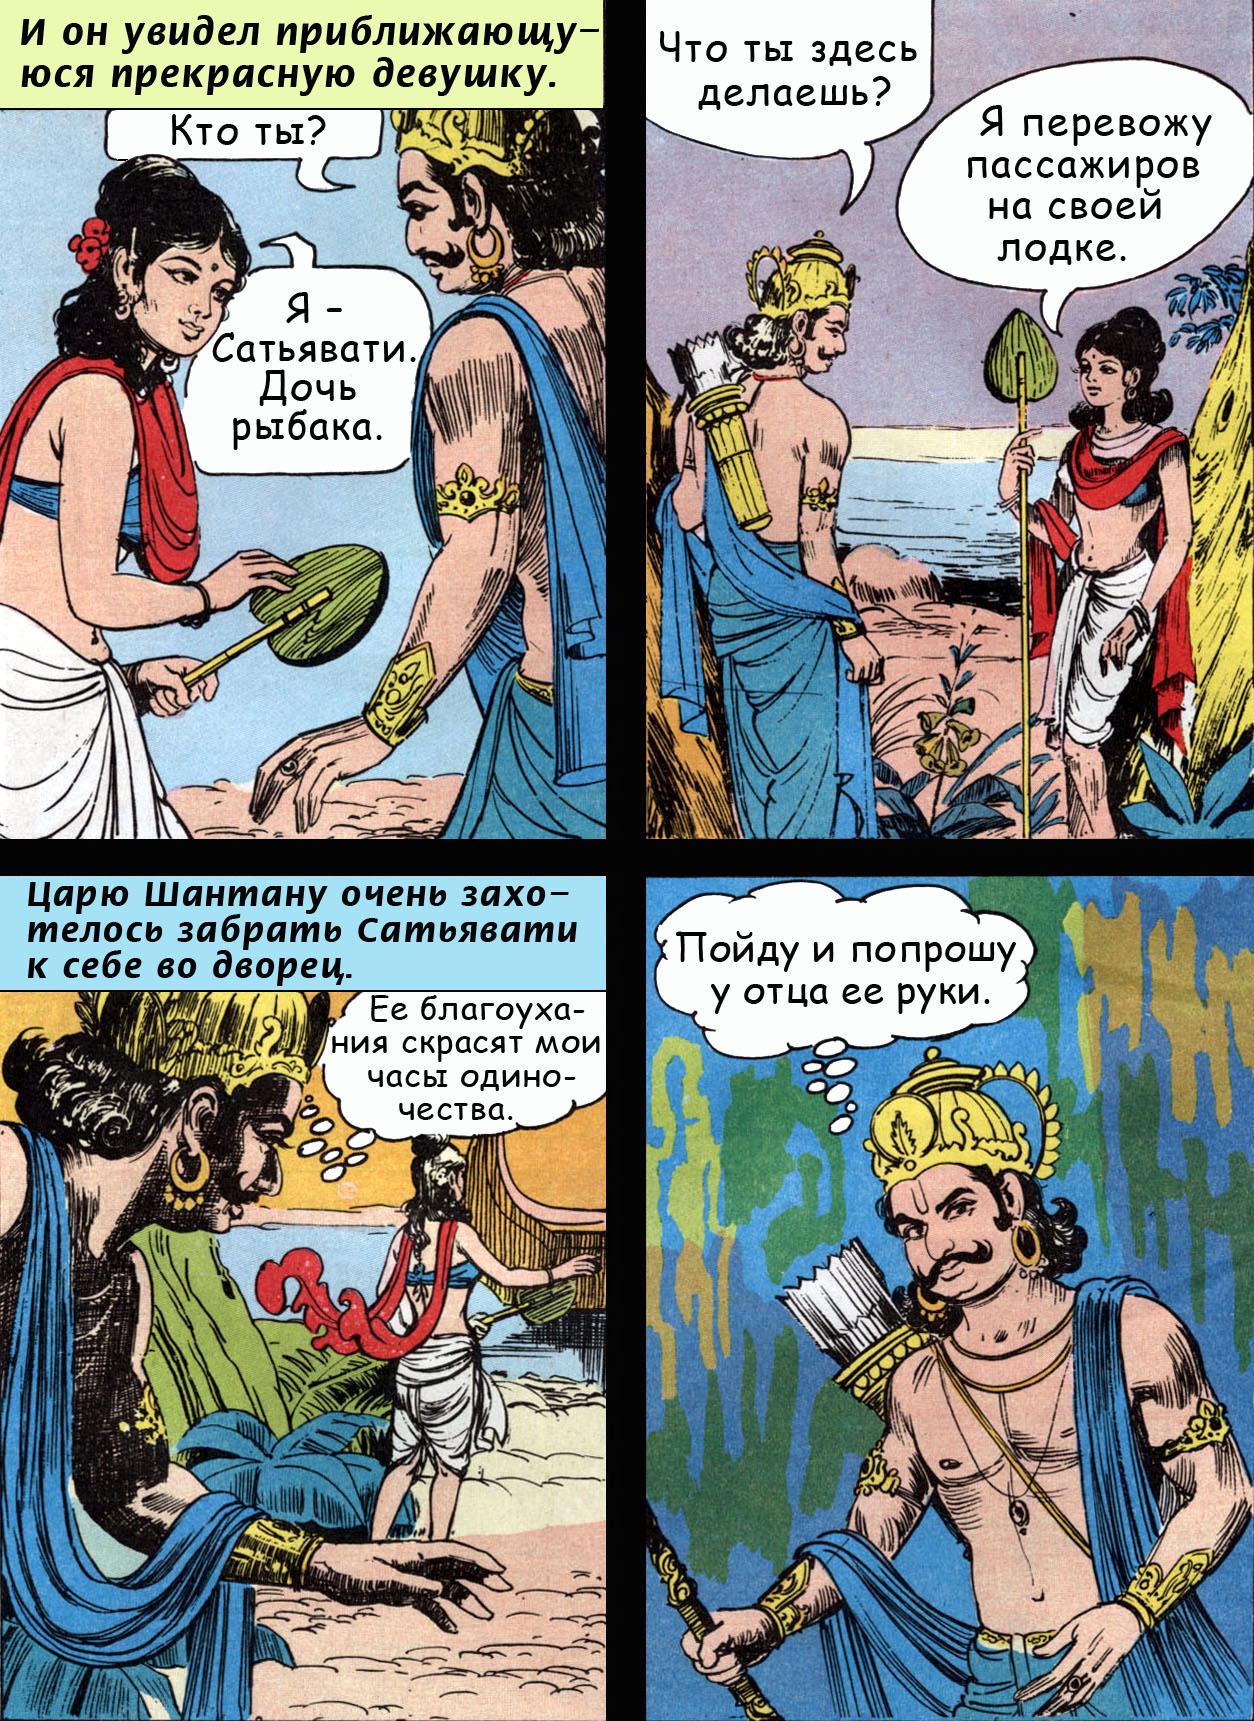 Бхишма 12 - ведический комикс